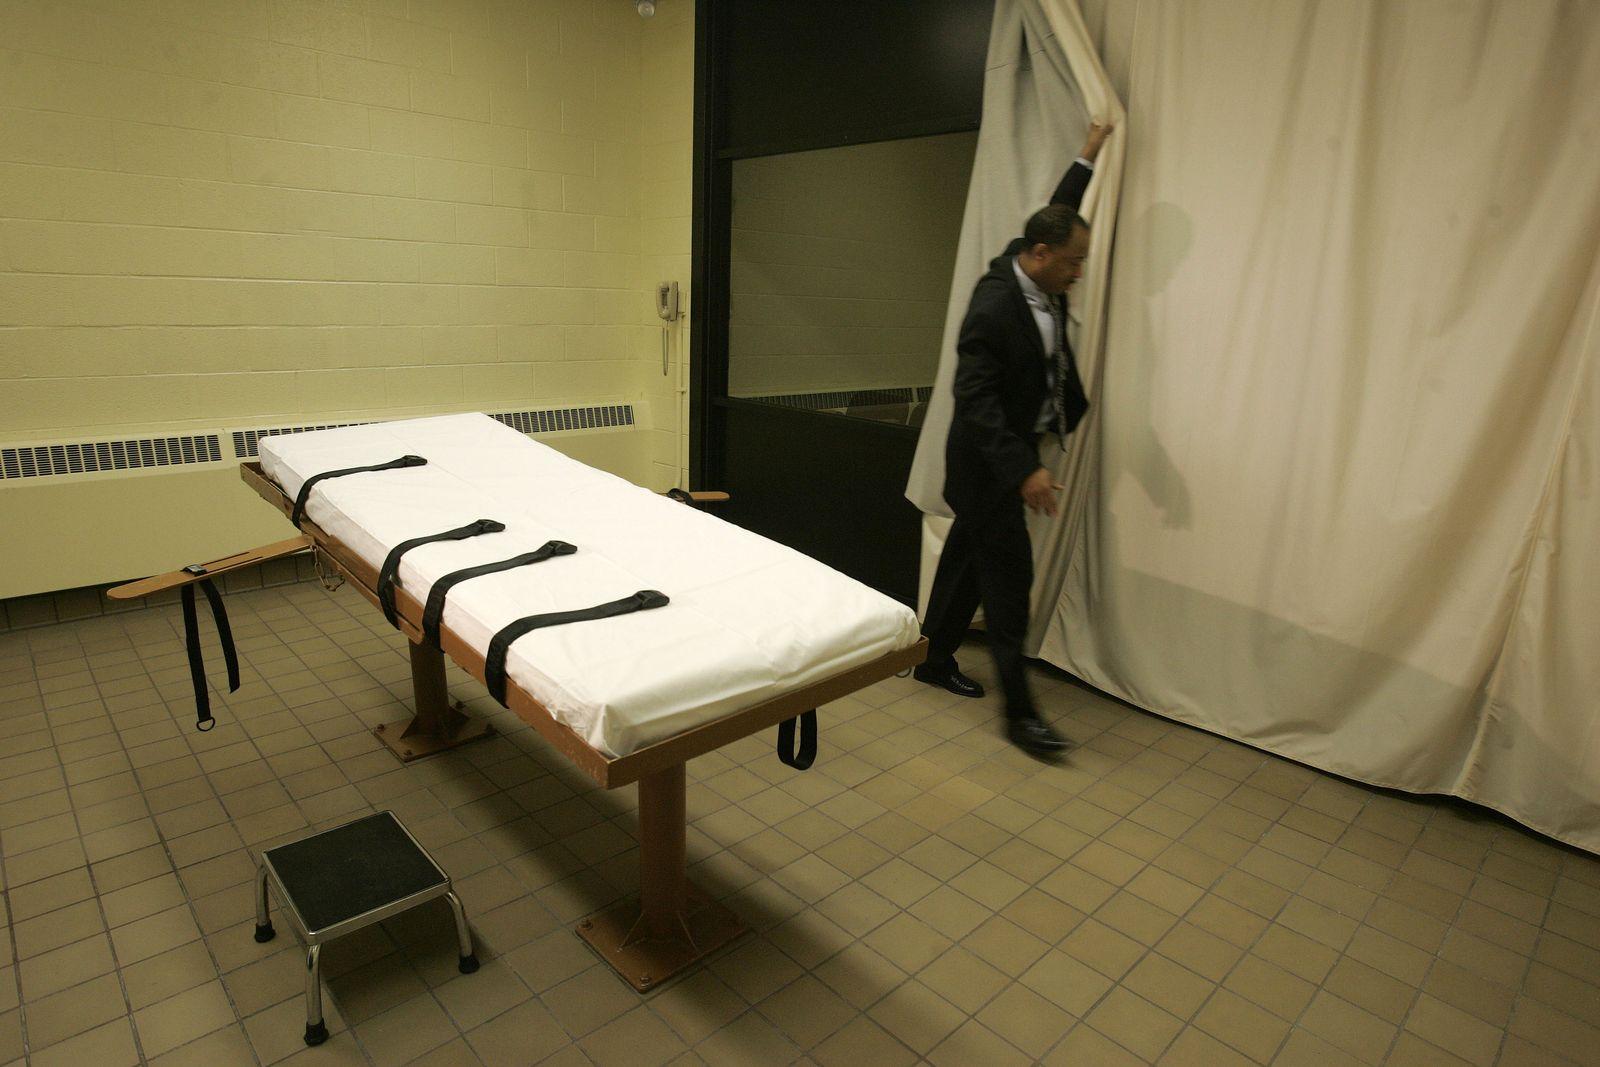 Executions capital punishment